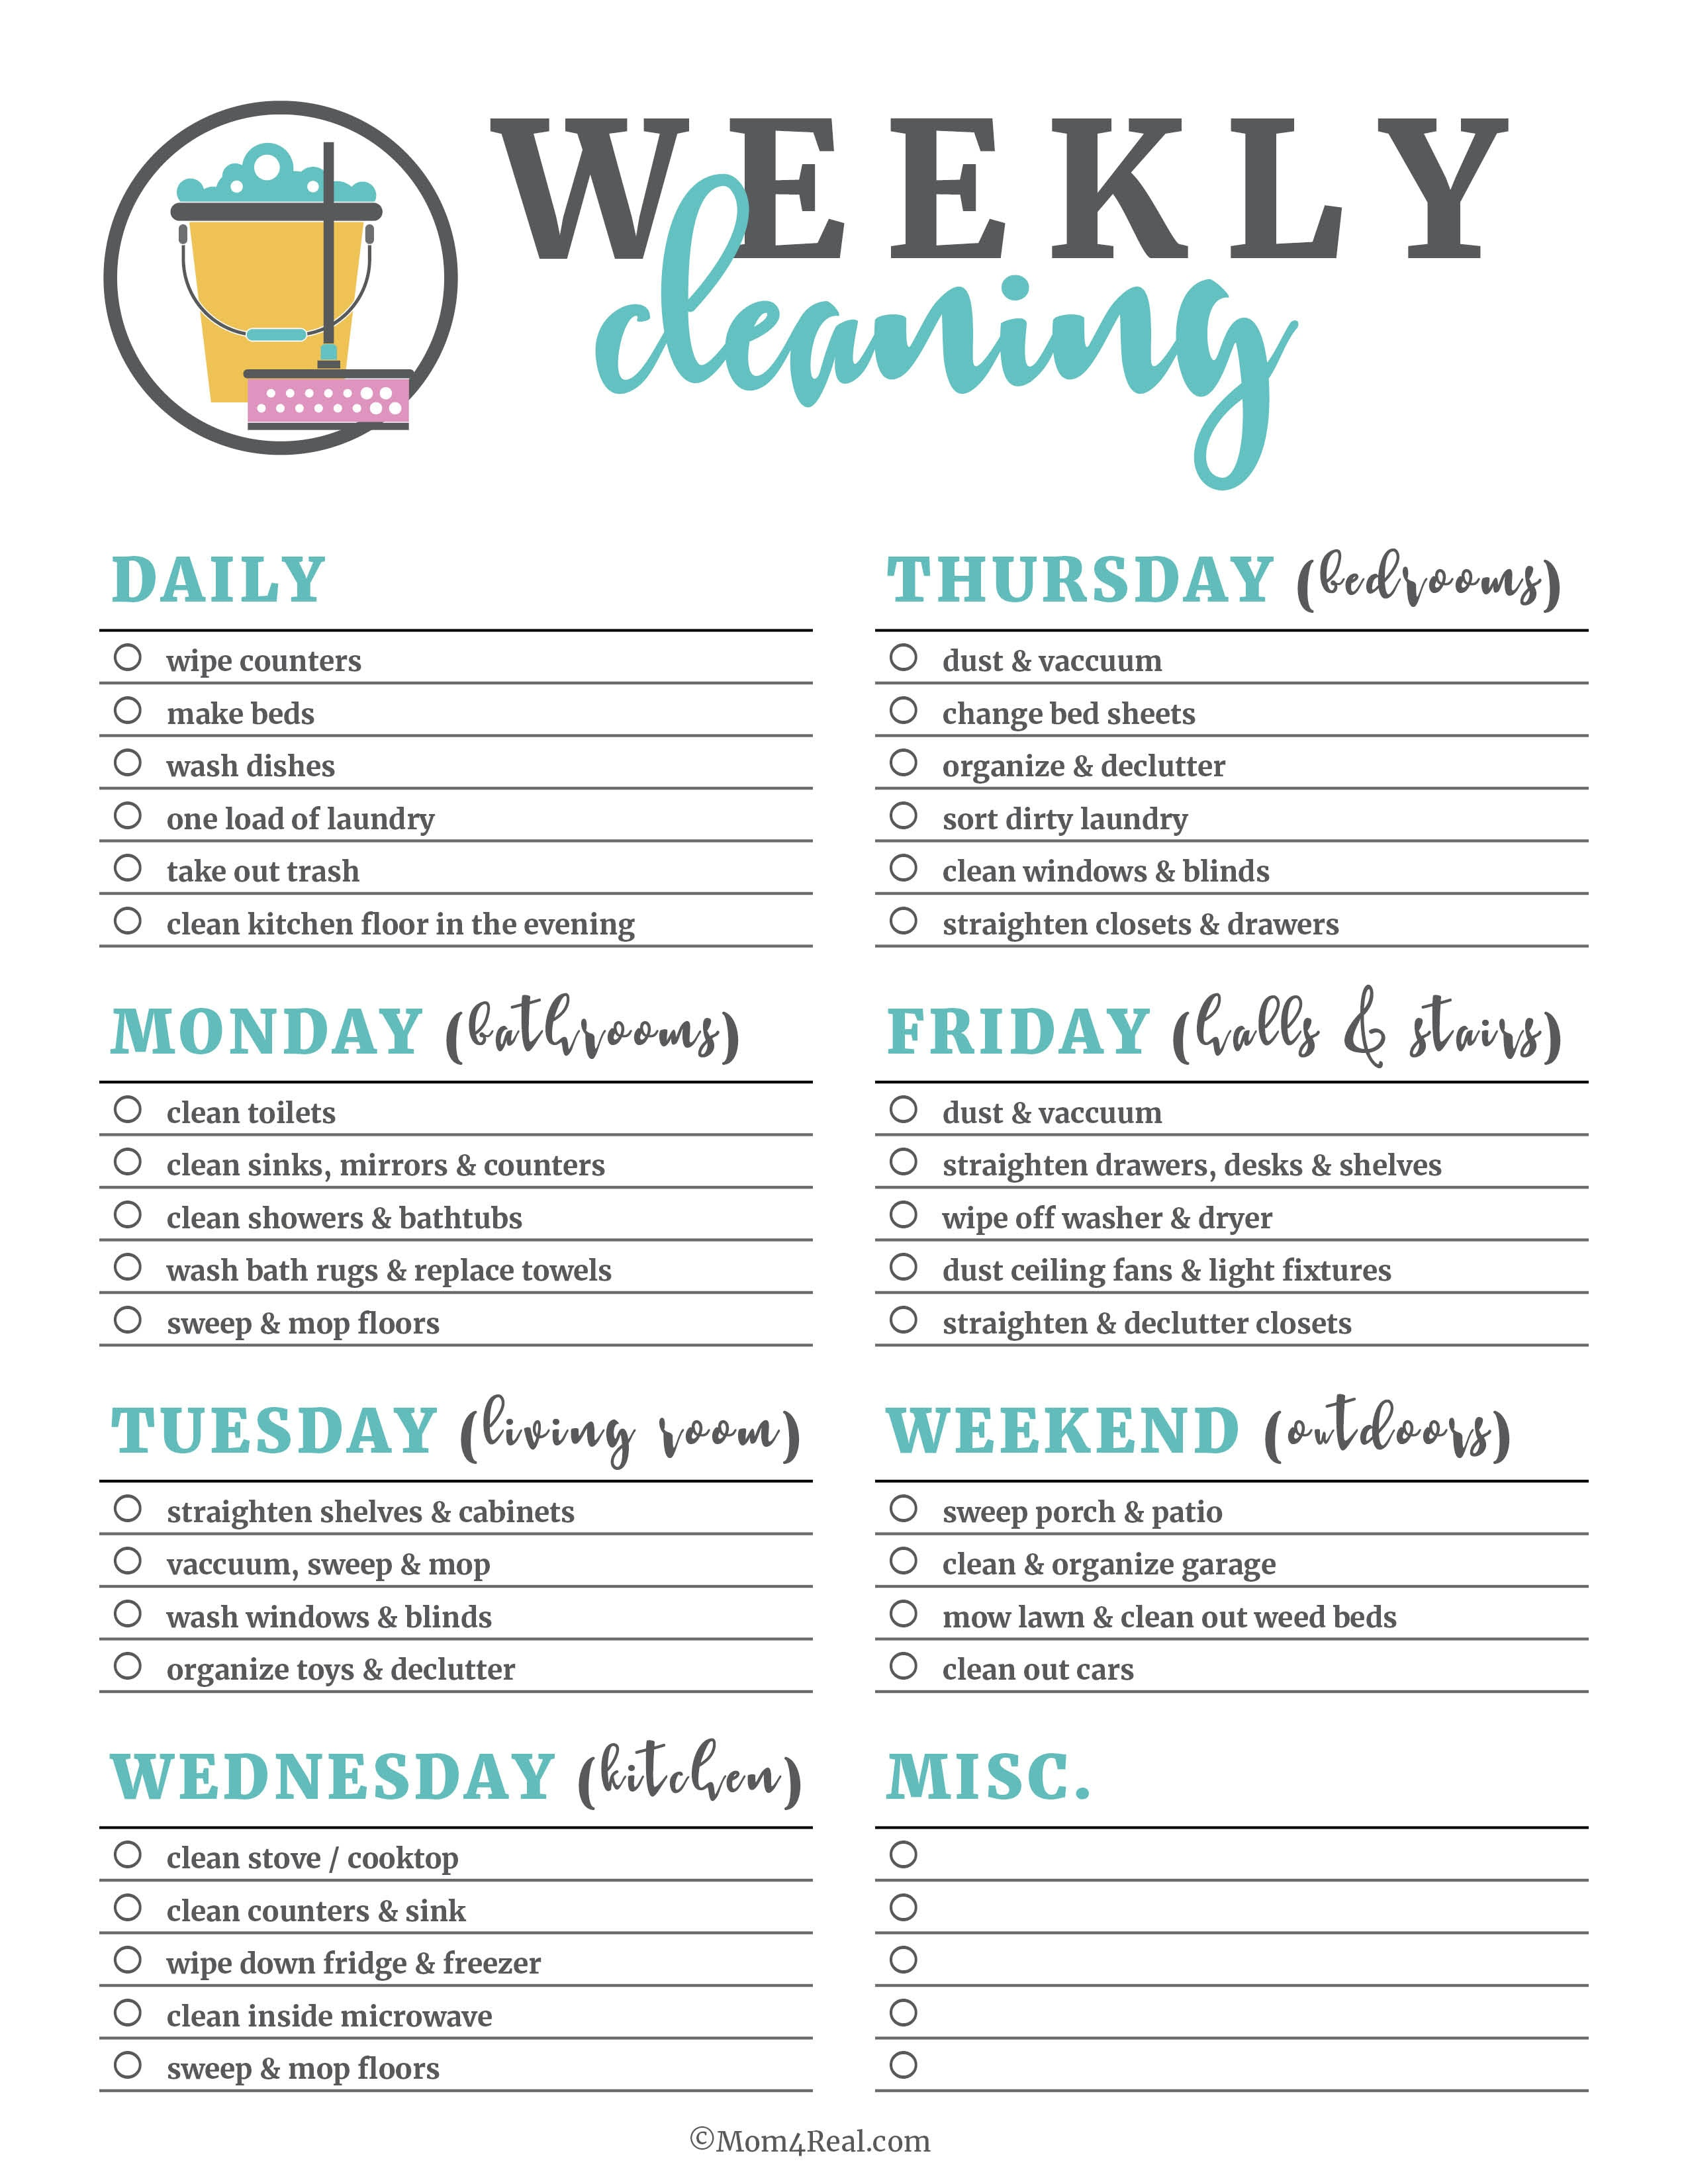 Free Printable Housework Checklist